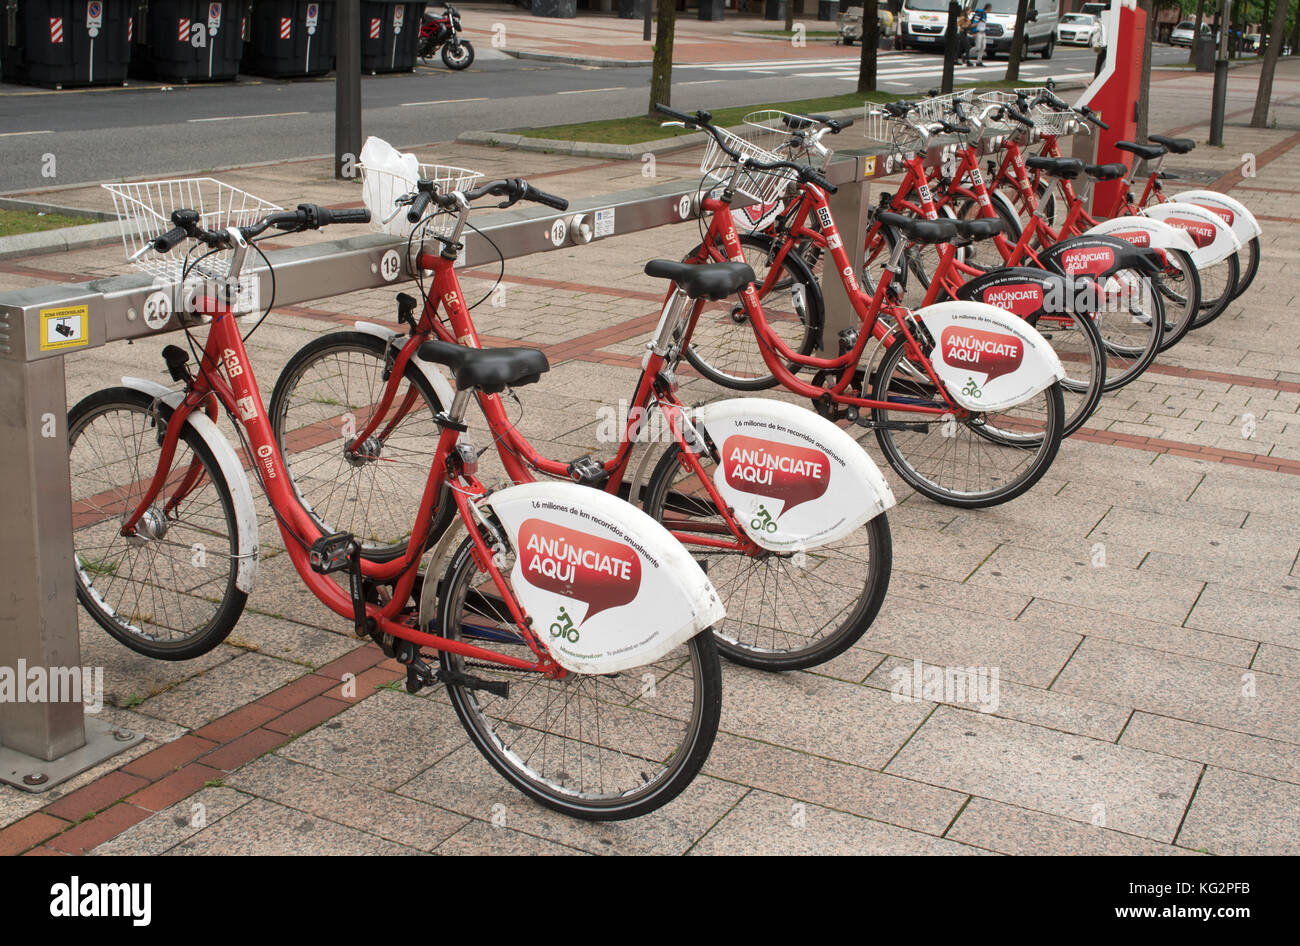 A row of hire bikes, Bilbao, Spain, Europe - Stock Image